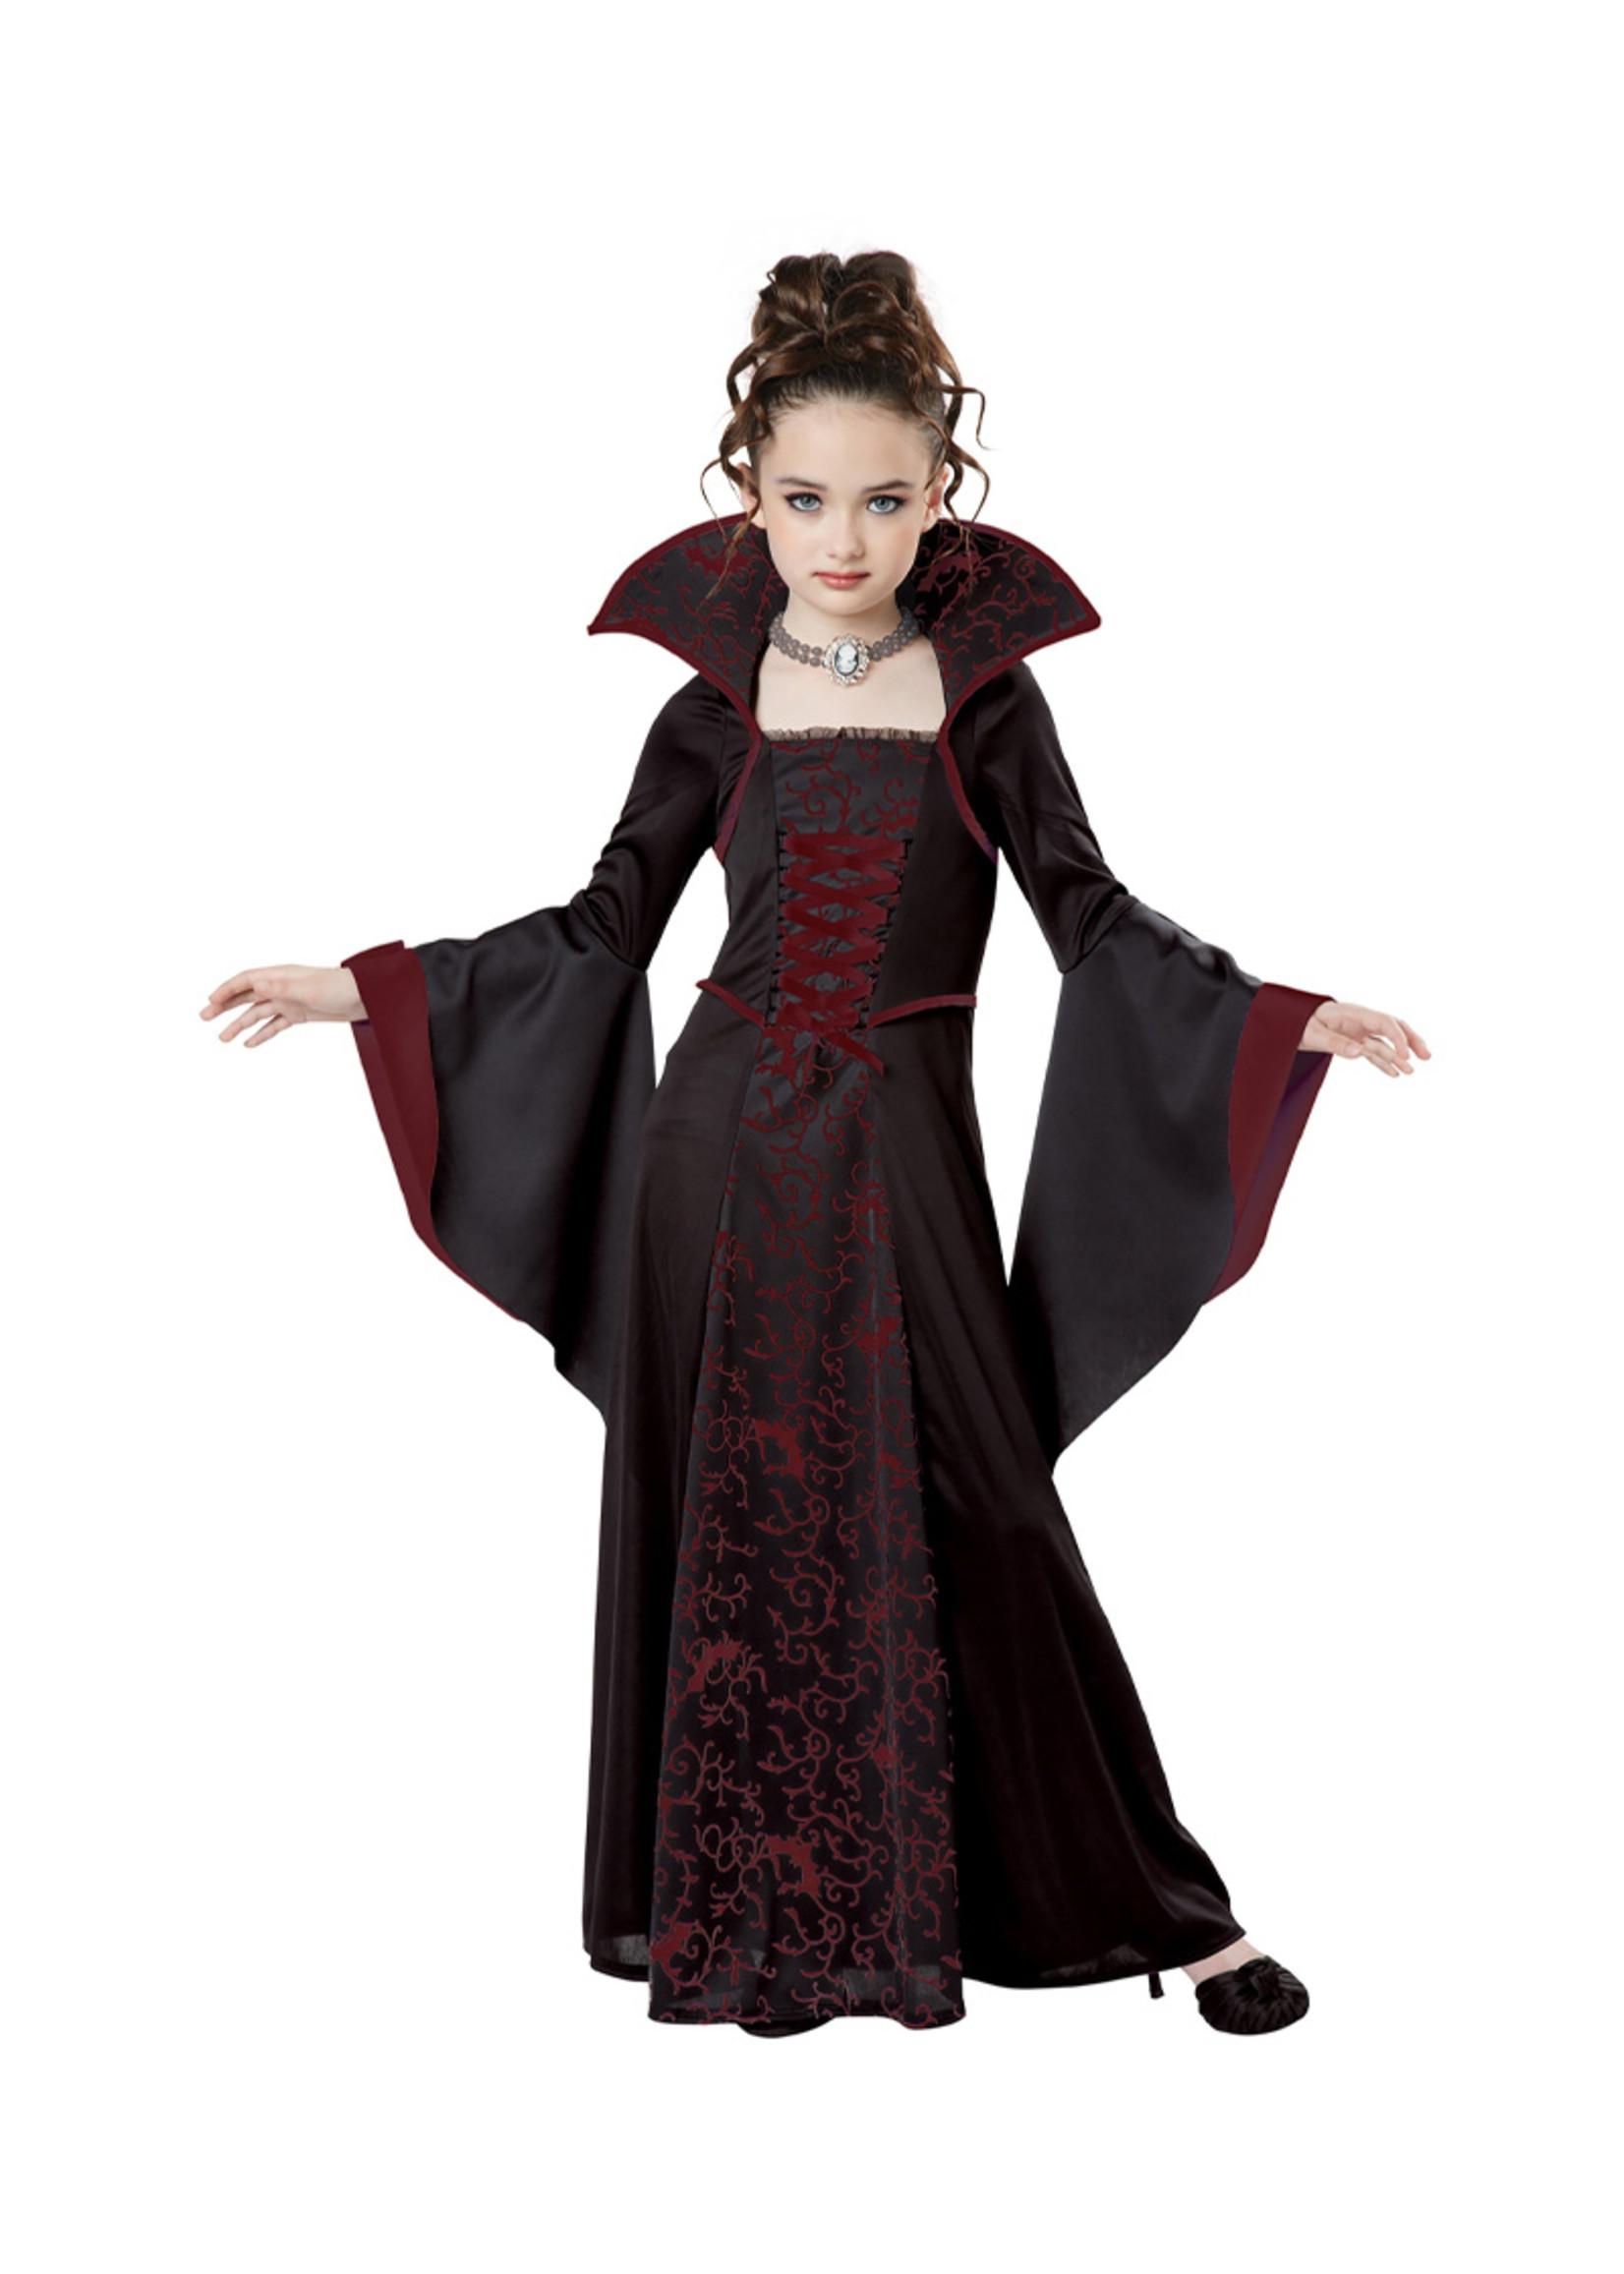 Royal Vampiress Costume - Girls